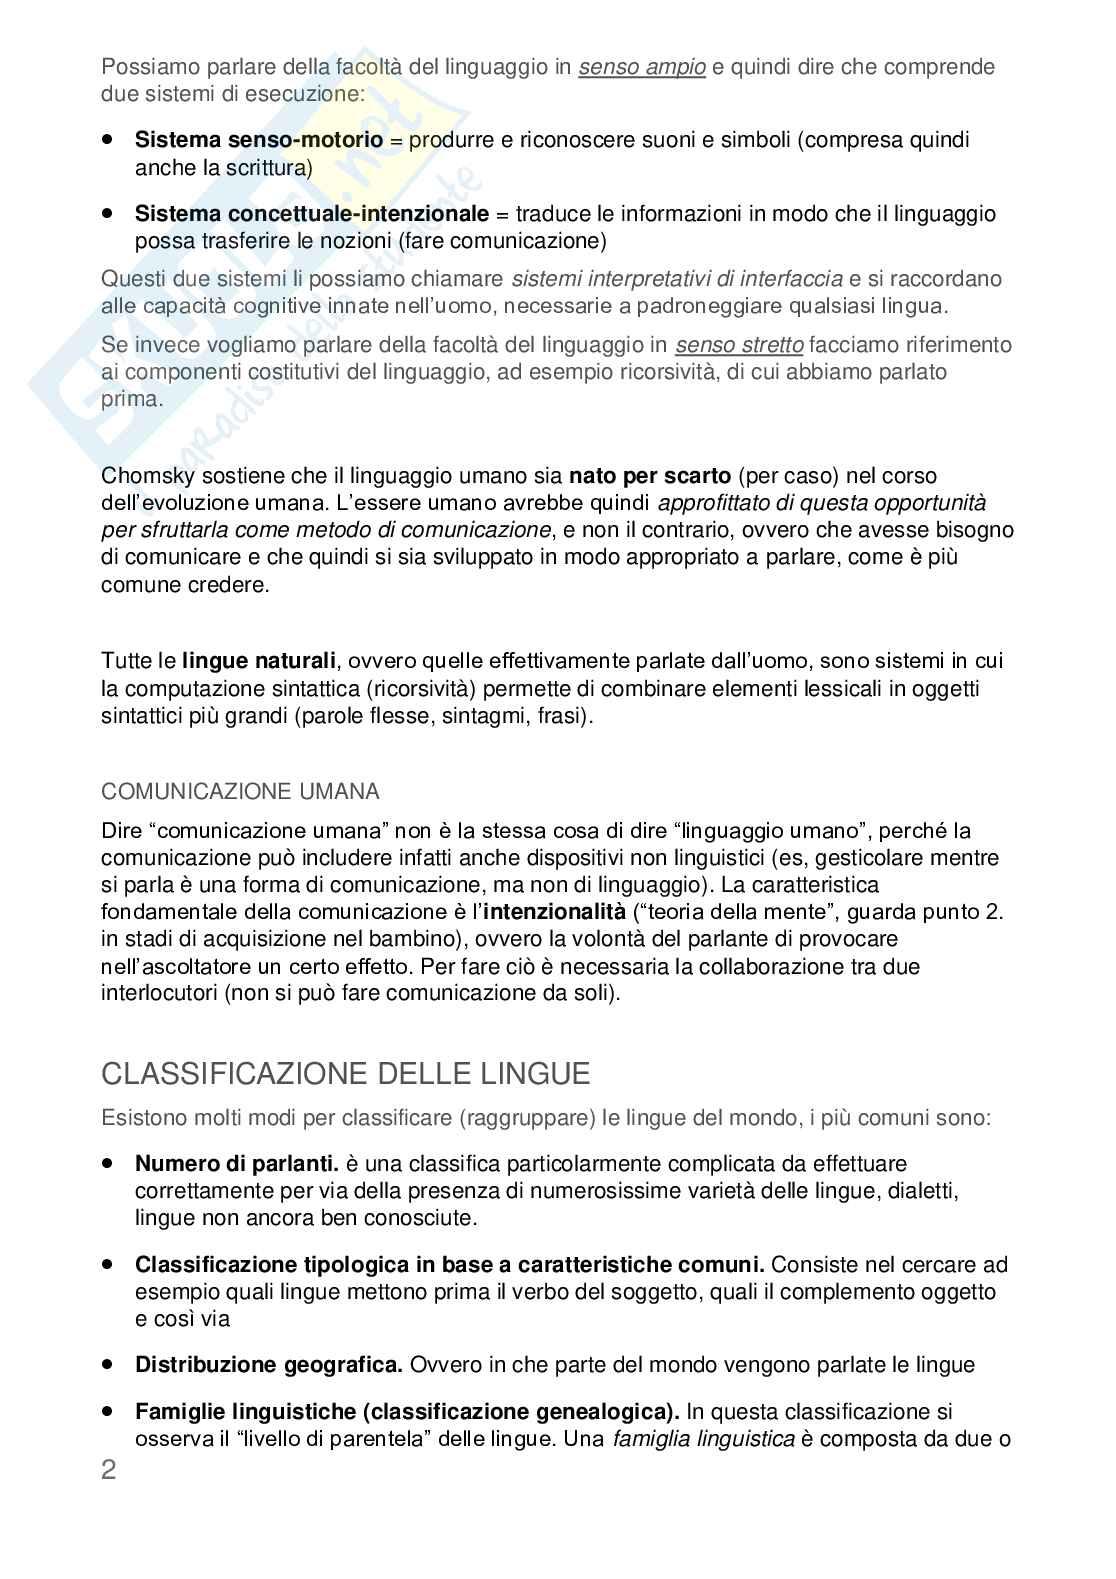 Appunti Linguistica Generale Pag. 2